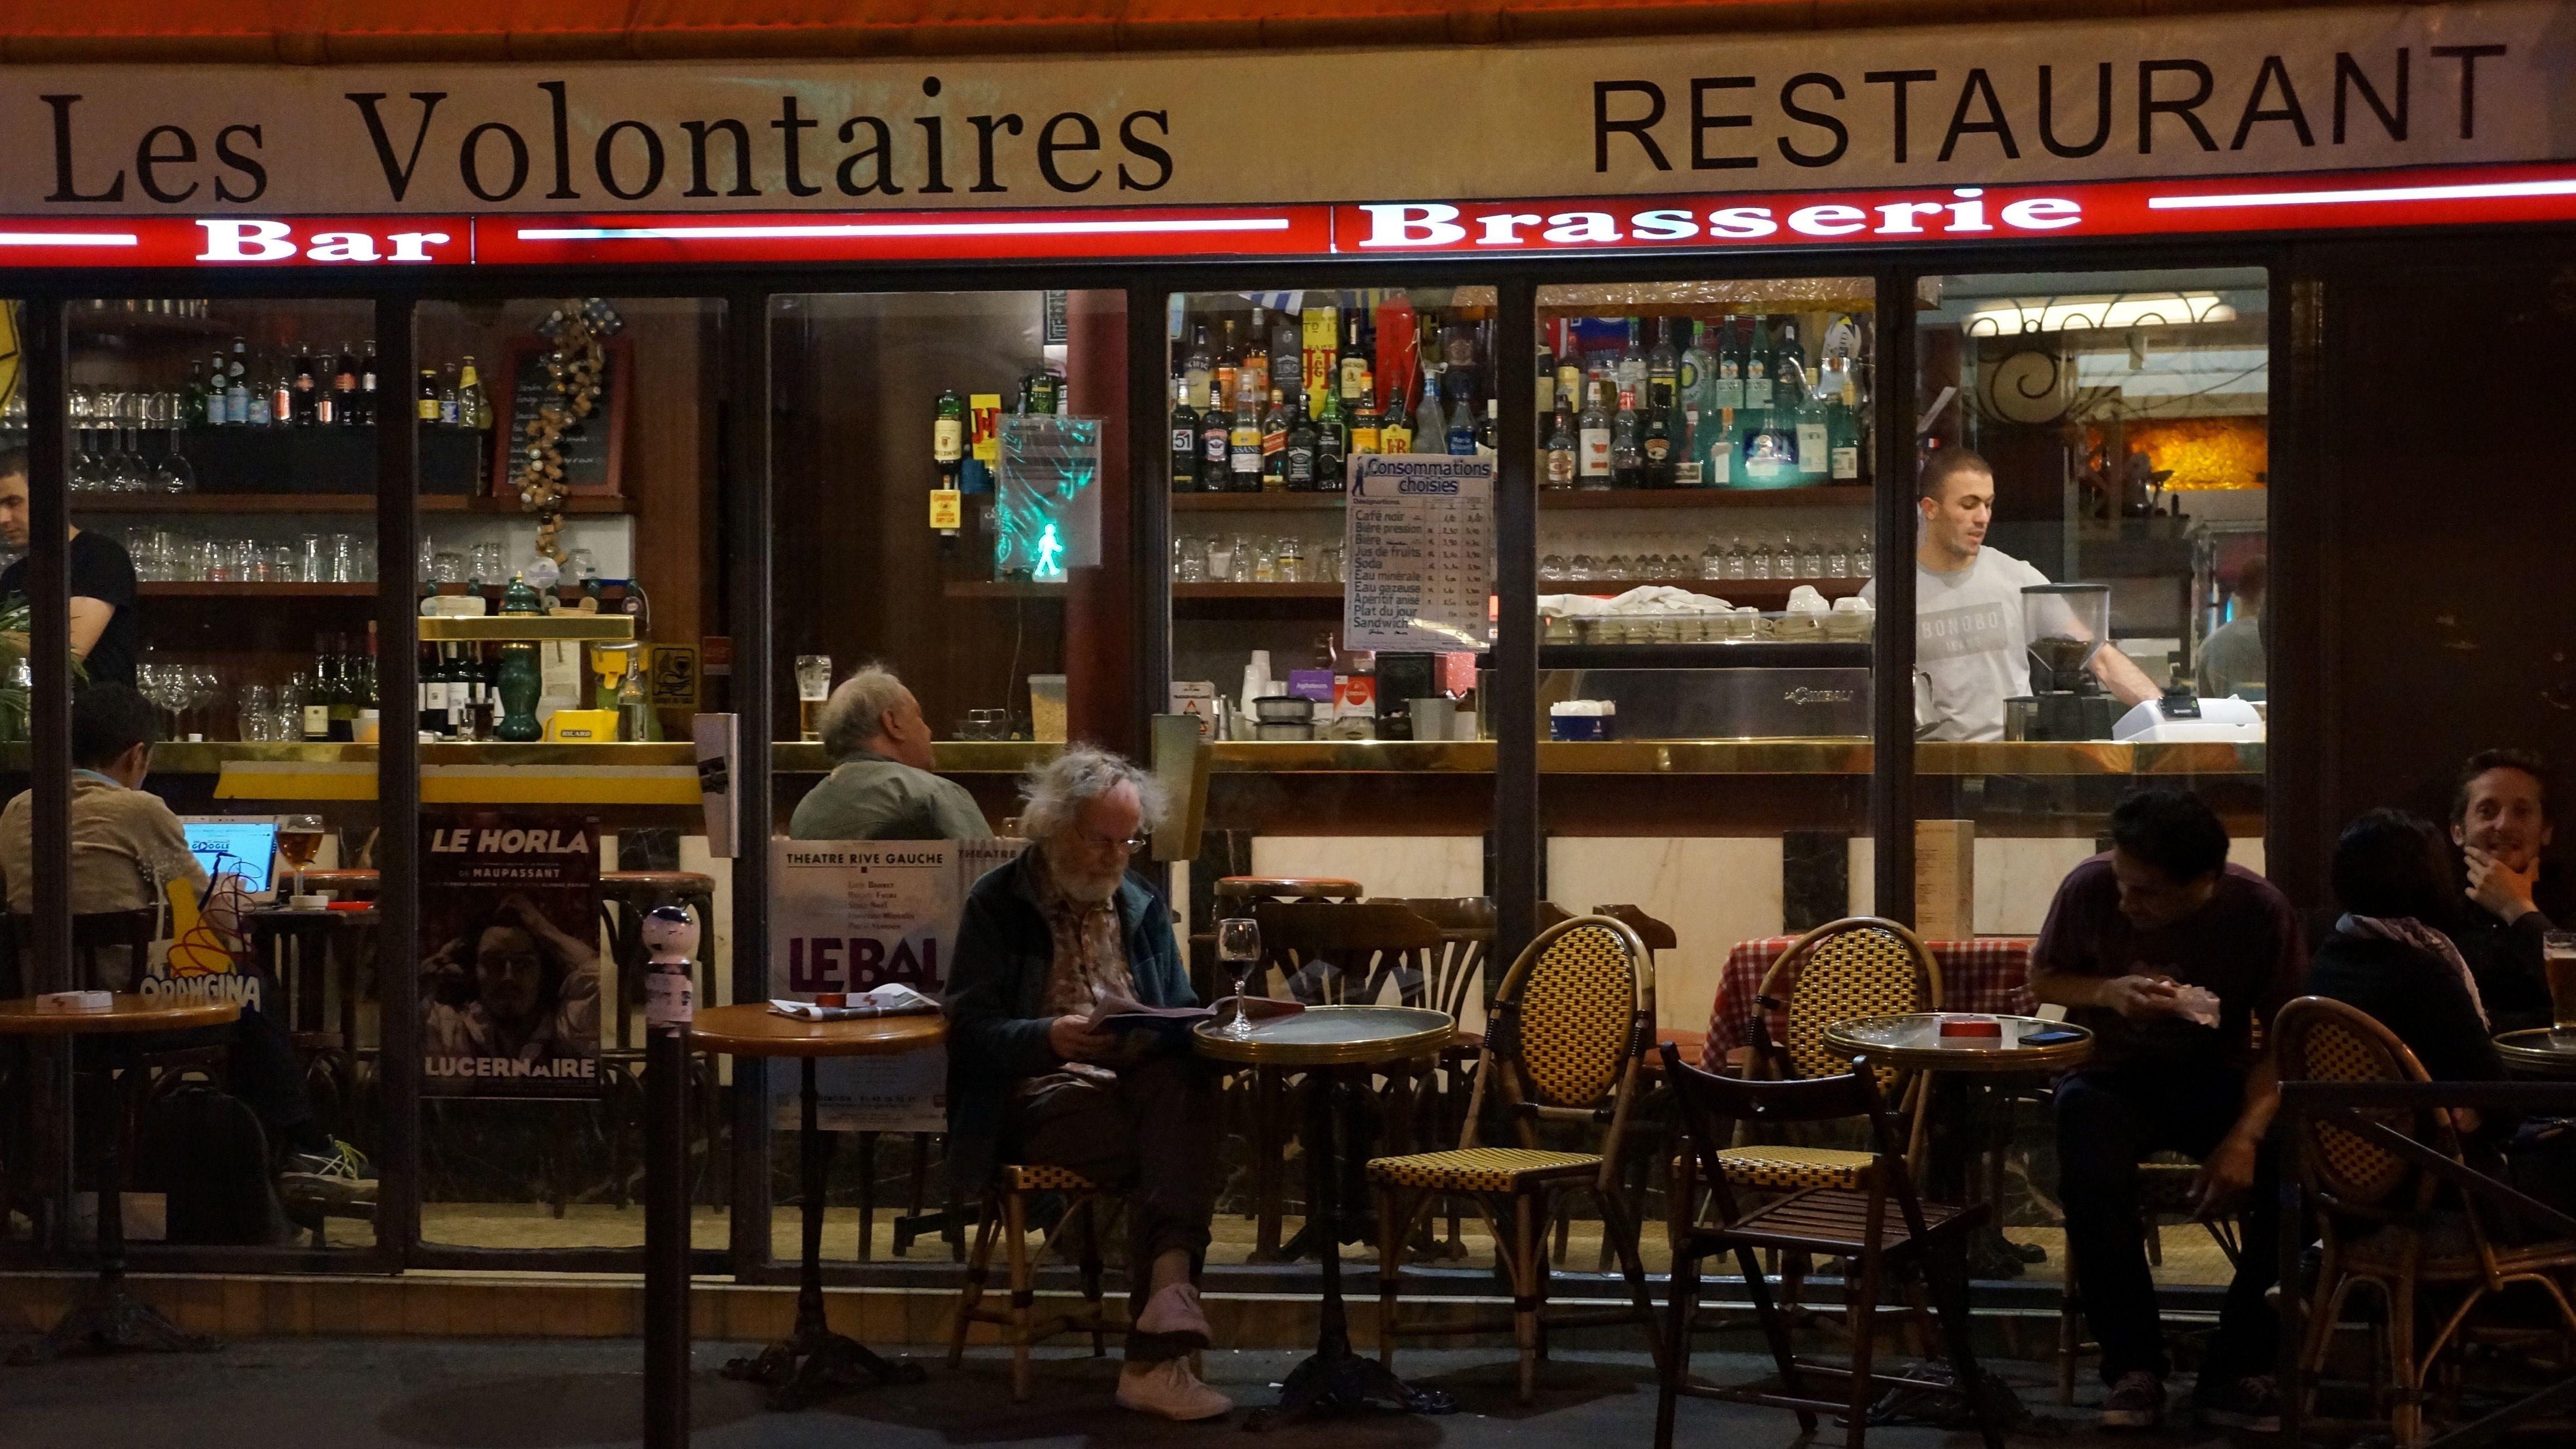 NYC - best restaurant seeker